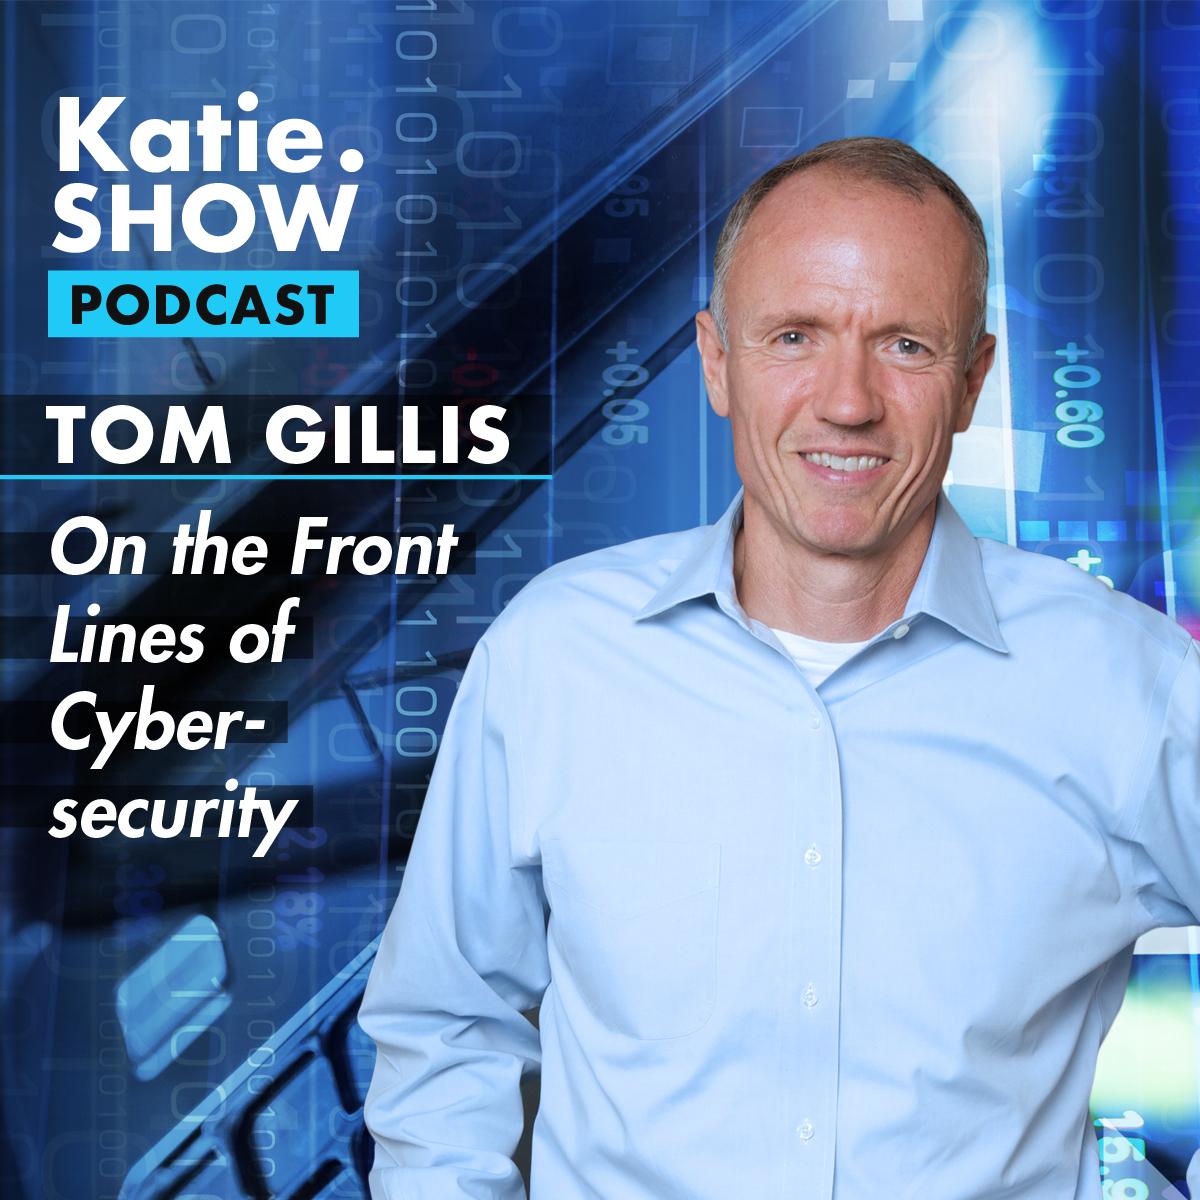 Tom-Gillis-and-Katie-Linendoll.jpg